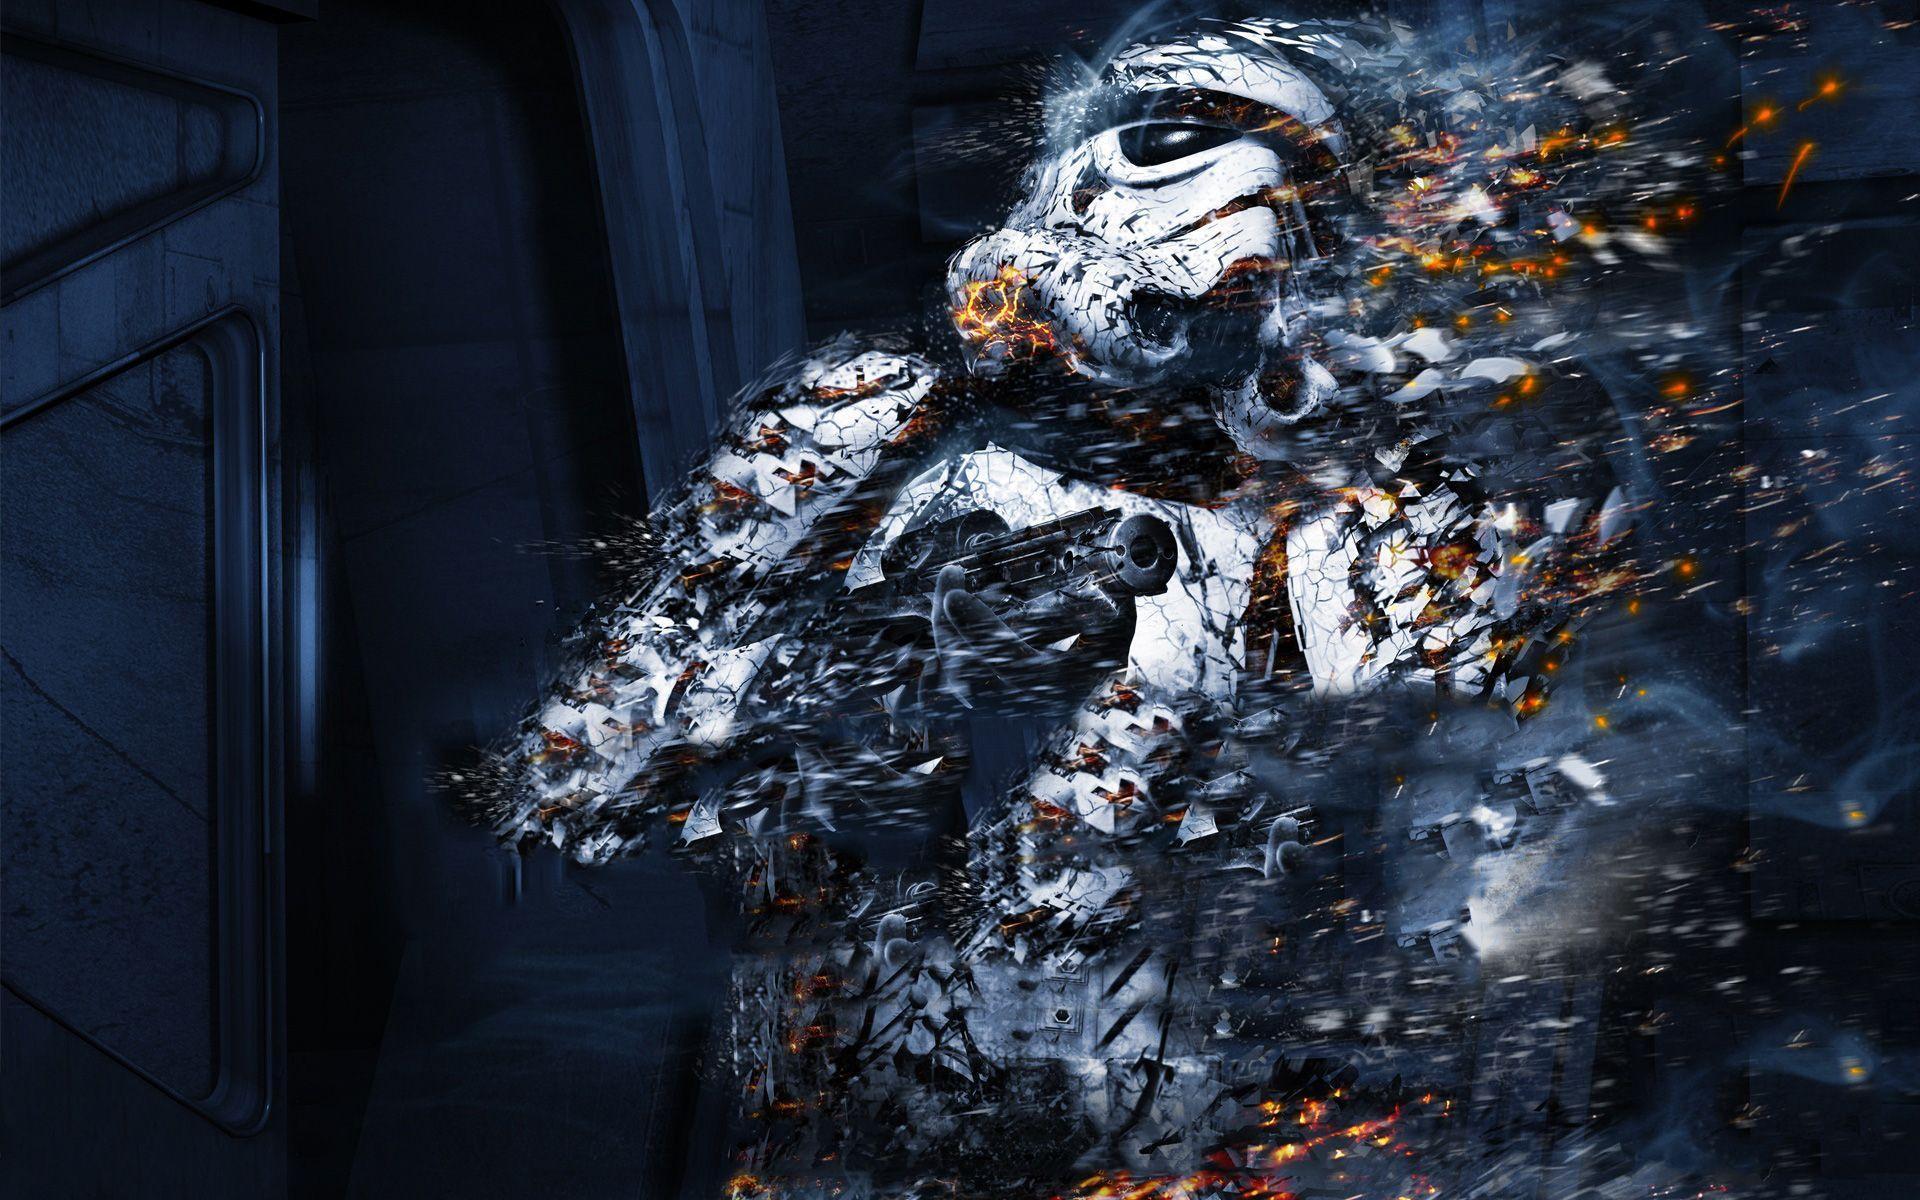 Sci Fi Star Wars Stormtrooper Wallpaper | Star Wars | Pinterest ...